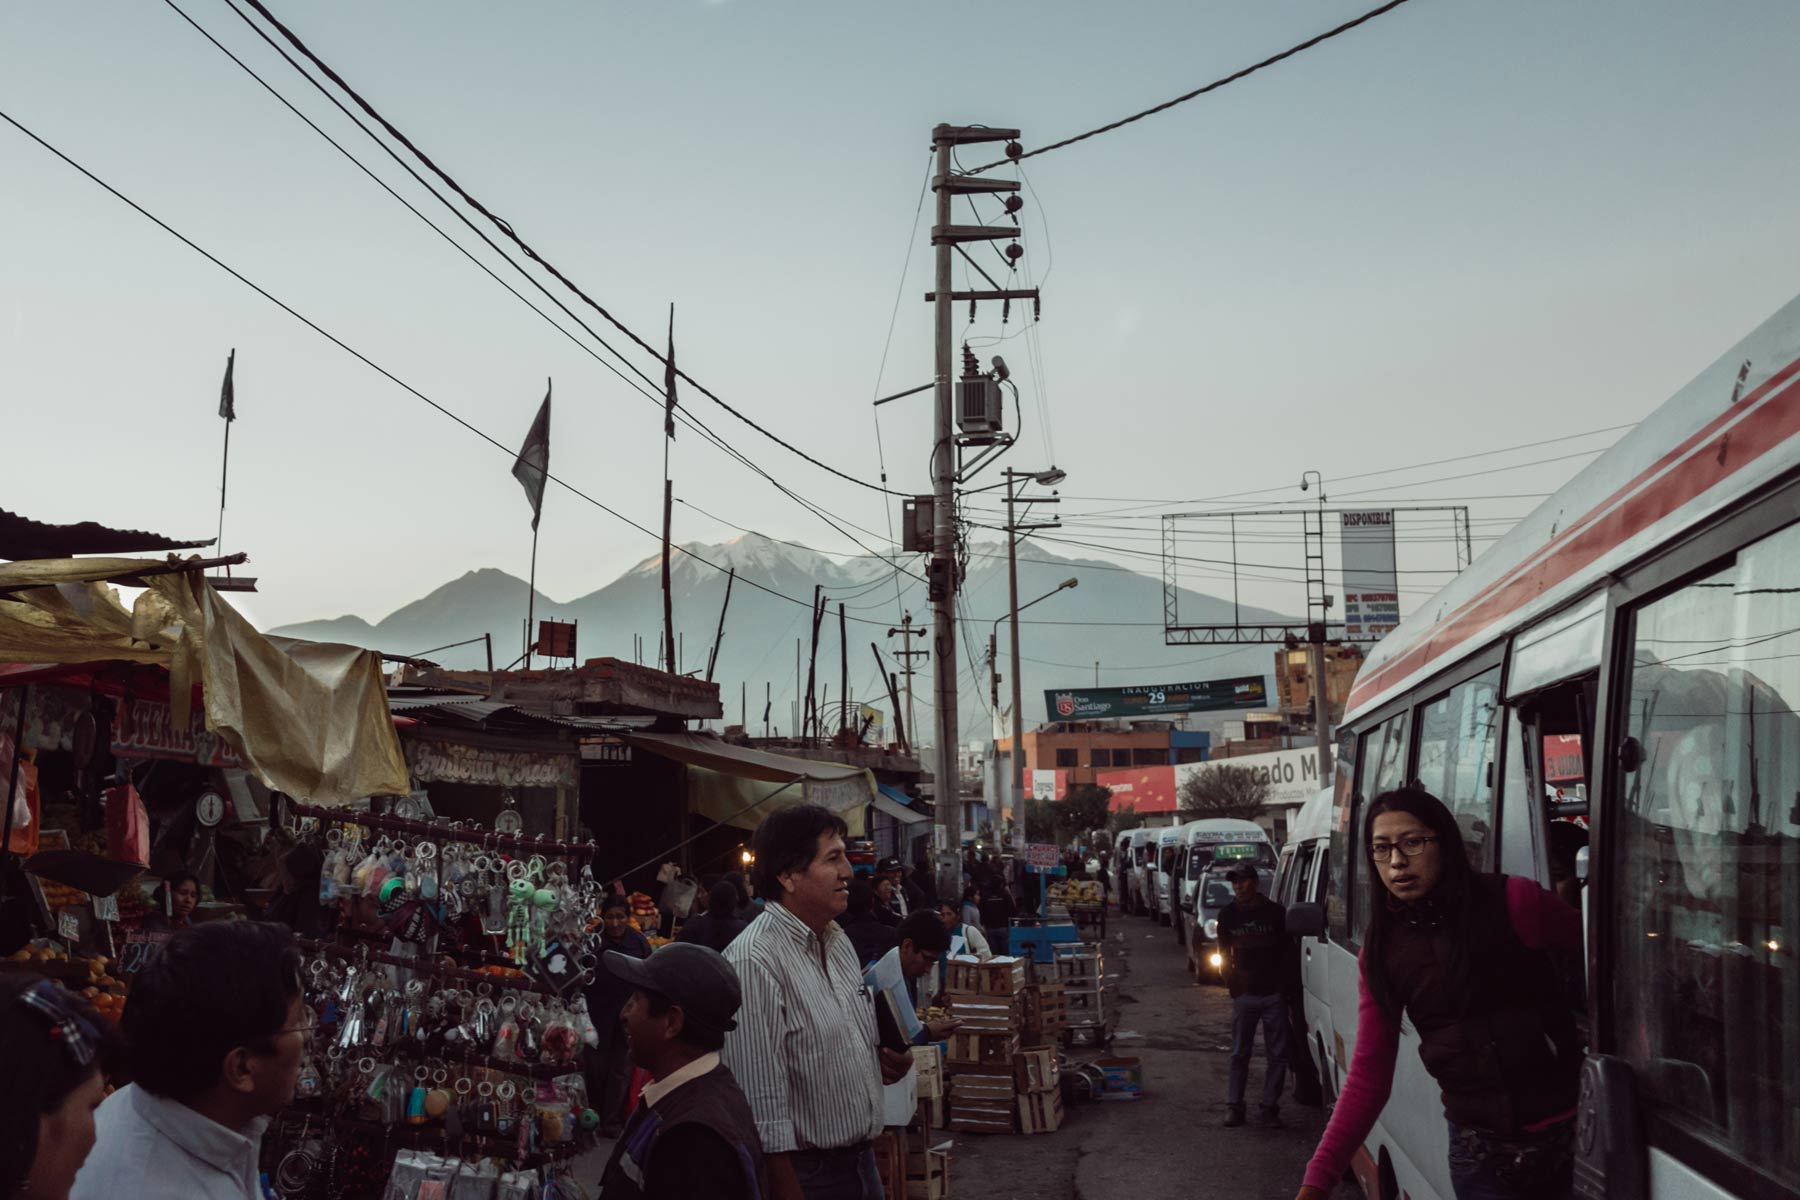 A van picks up passengers during rush hour in Arequipa.